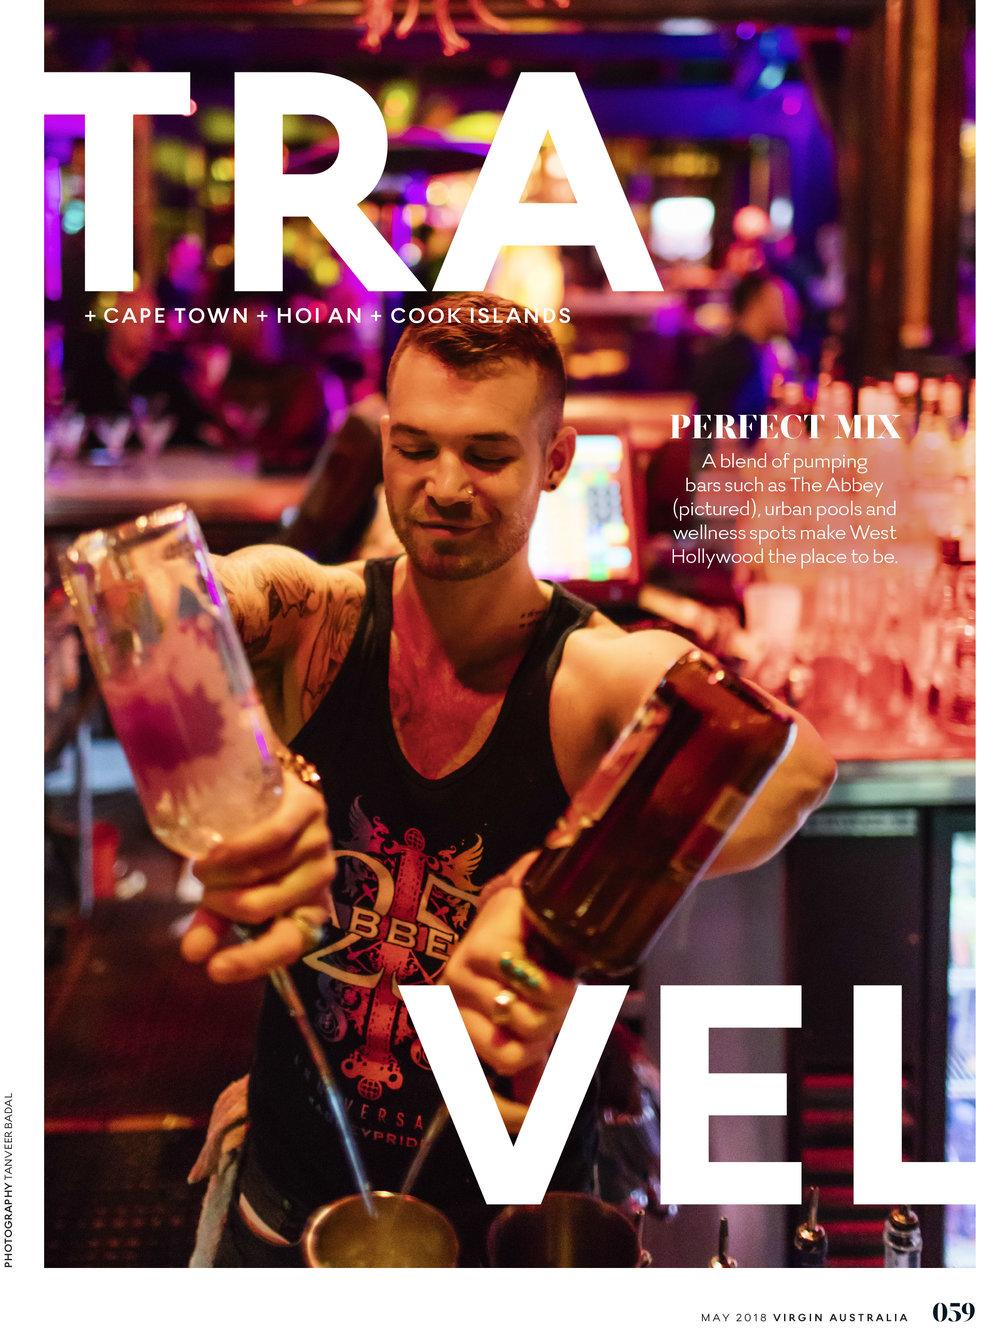 Virgin Australia Voyeur Magazine - May 2018